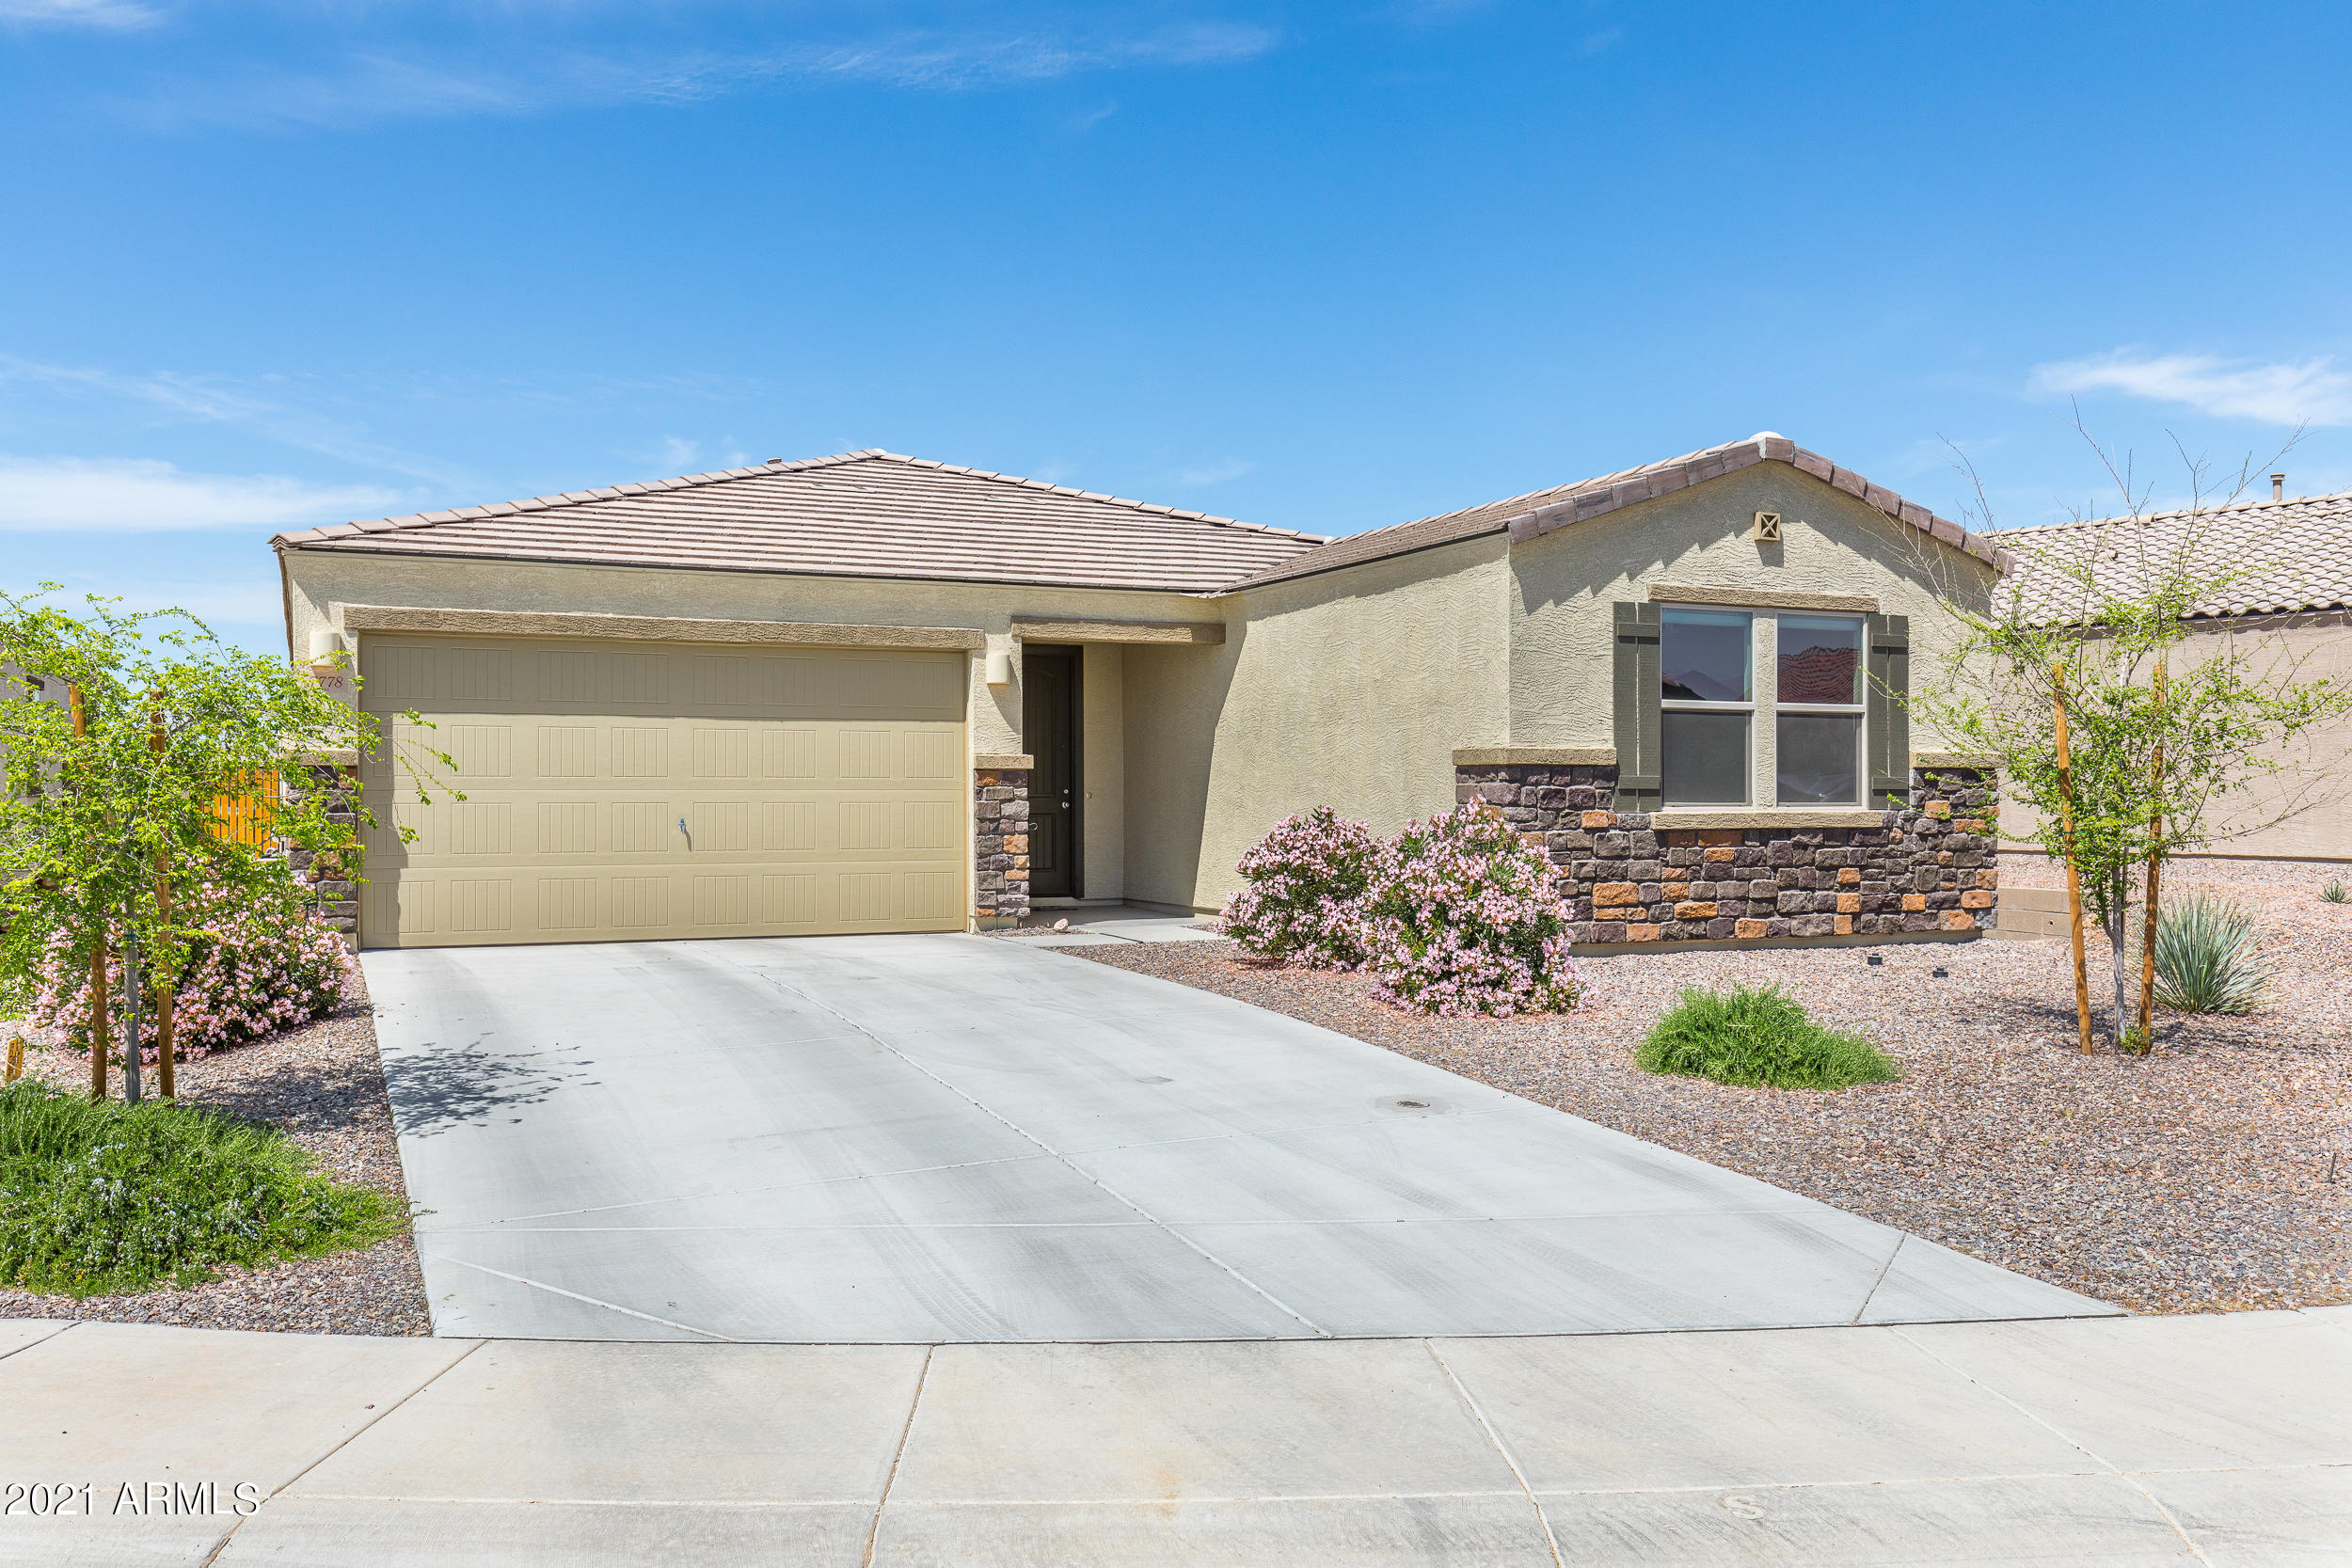 7778 S AGASSIZ PEAK Court, Gold Canyon, AZ 85118, 4 Bedrooms Bedrooms, ,Residential,For Sale,7778 S AGASSIZ PEAK Court,6222123